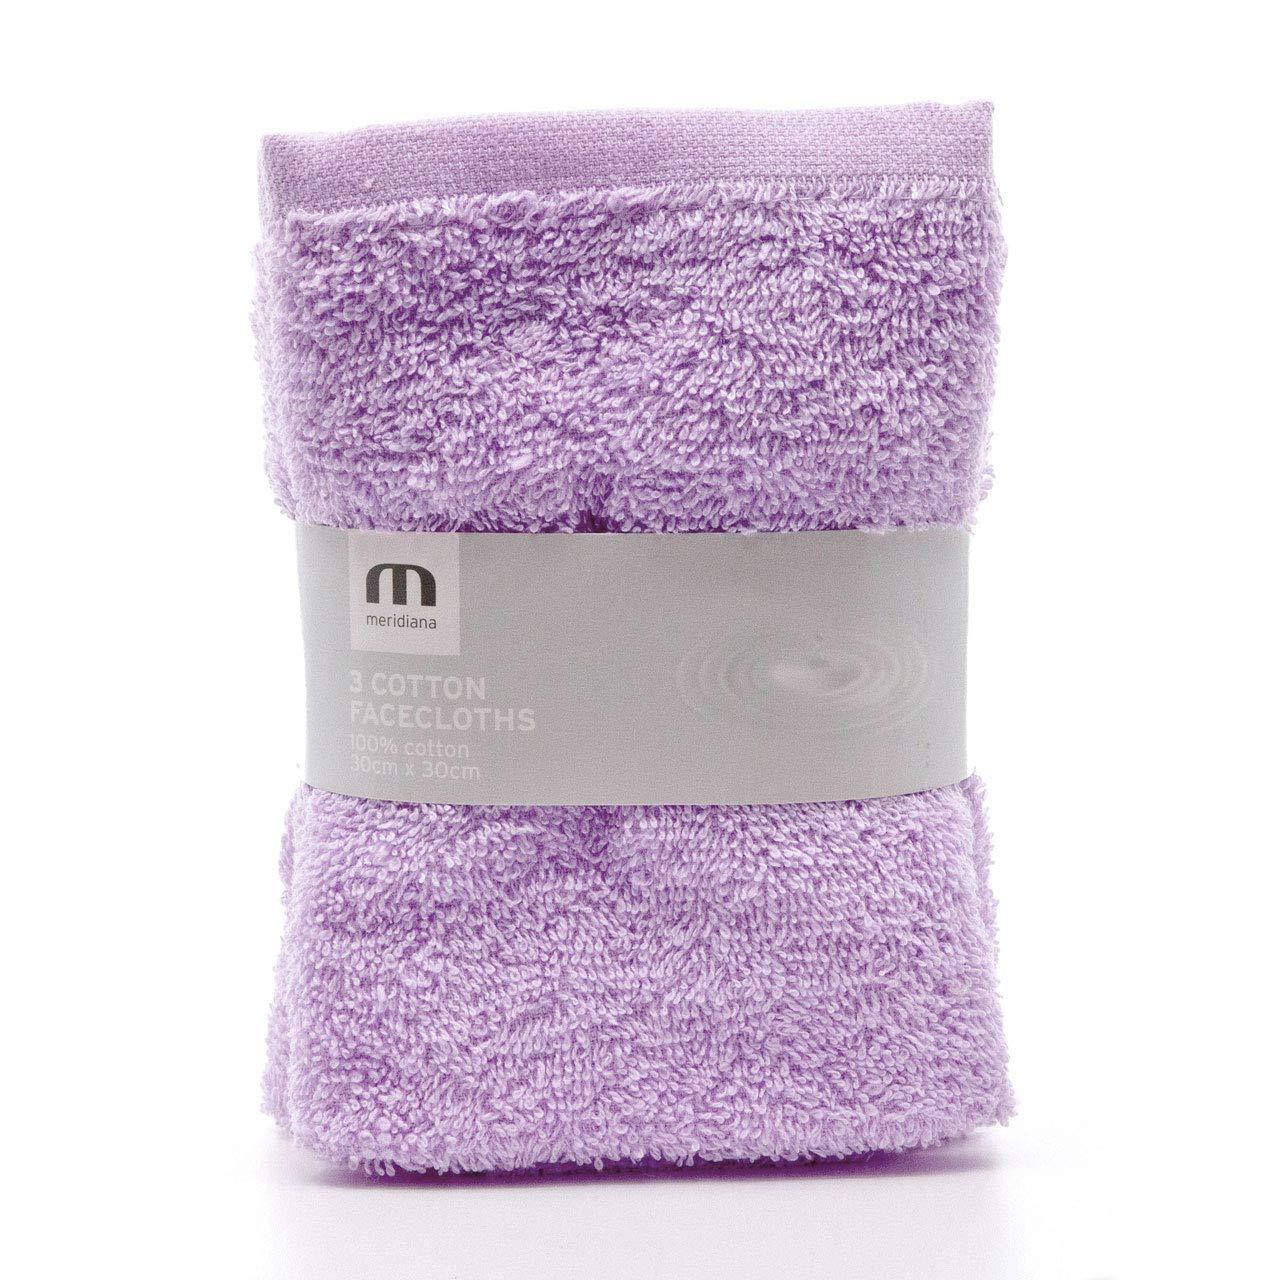 Meridiana Super Soft 100% Cotton Family Washcloths. Machine Washable. Cream. 3 Pack. 30cm x 30cm Paul Murray PLC ME016CREAM